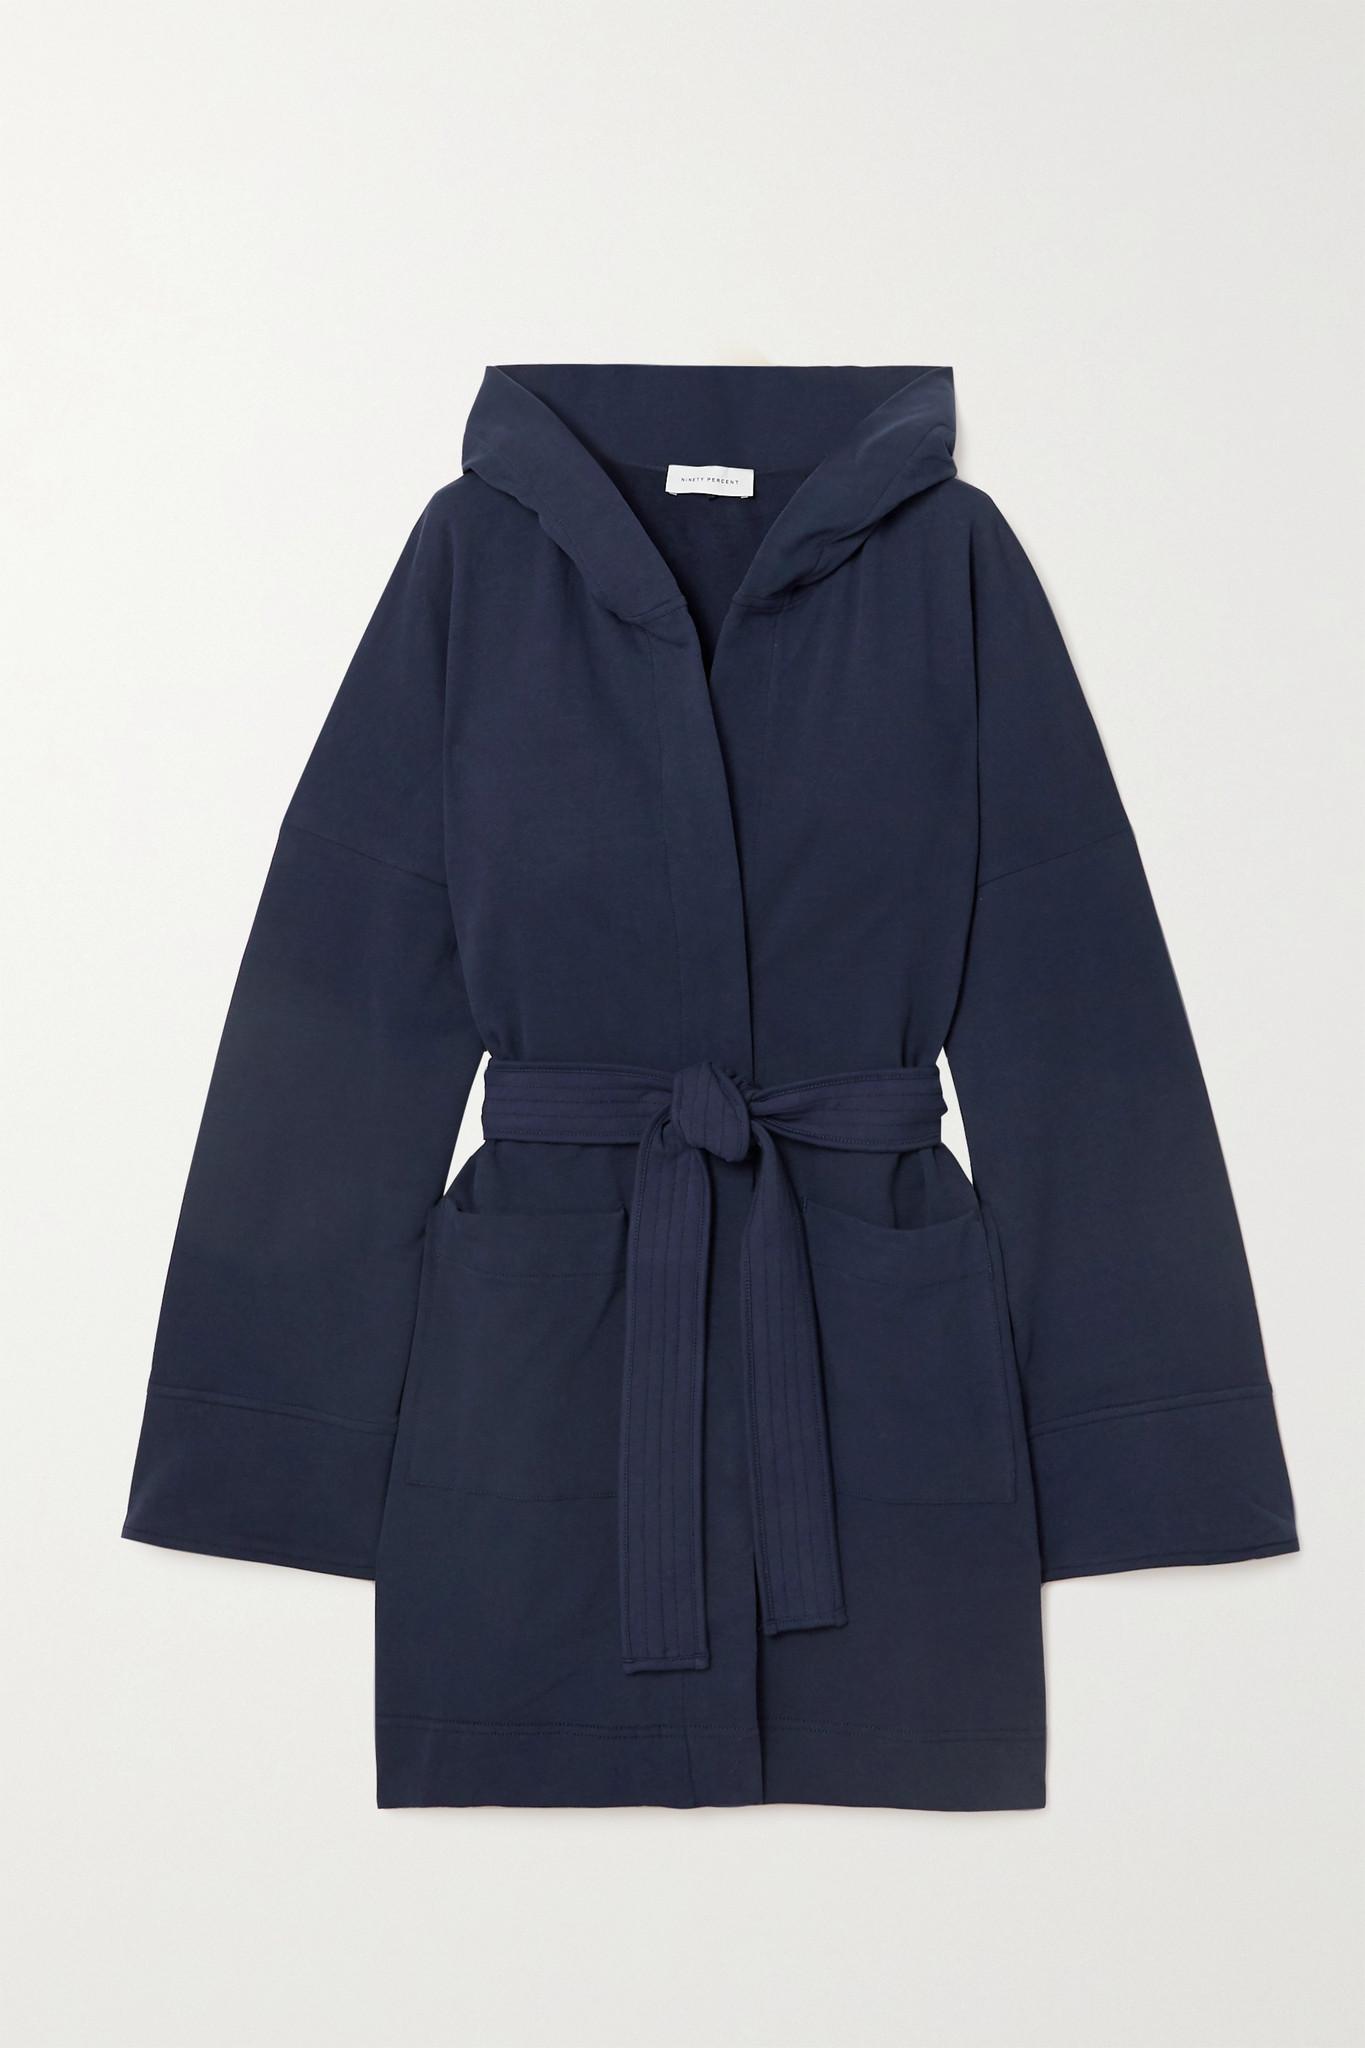 NINETY PERCENT - + Net Sustain Hooded Belted Organic Cotton-fleece Robe - Blue - medium